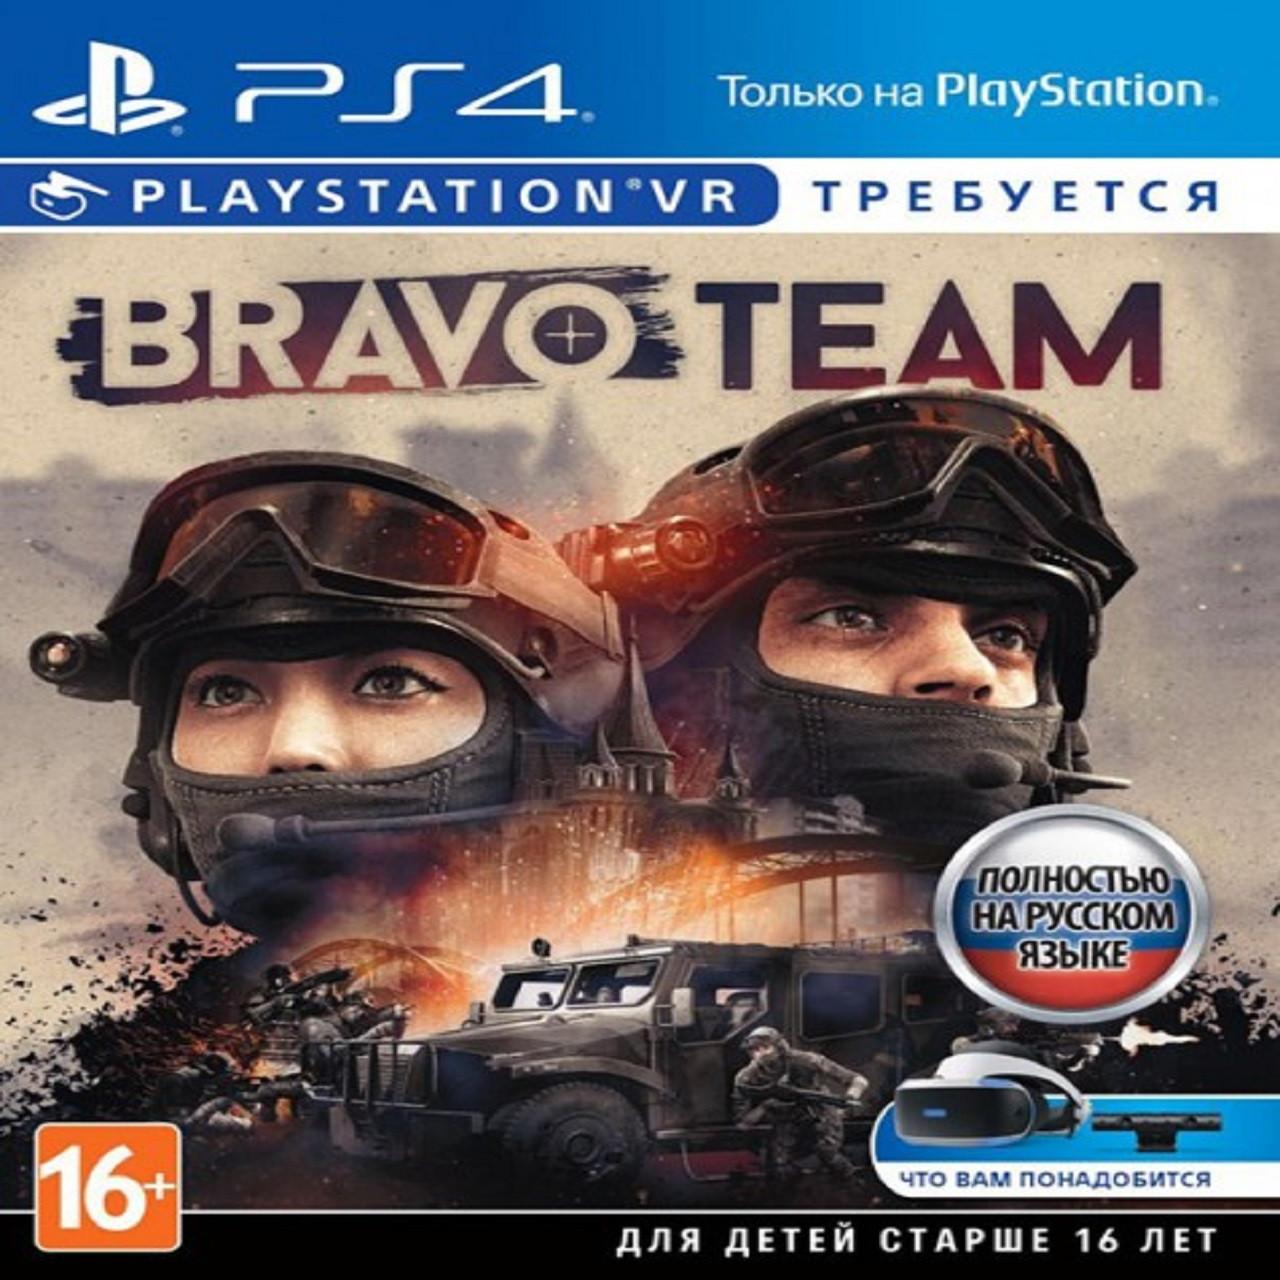 Bravo Team VR PS4 RUS (NEW)